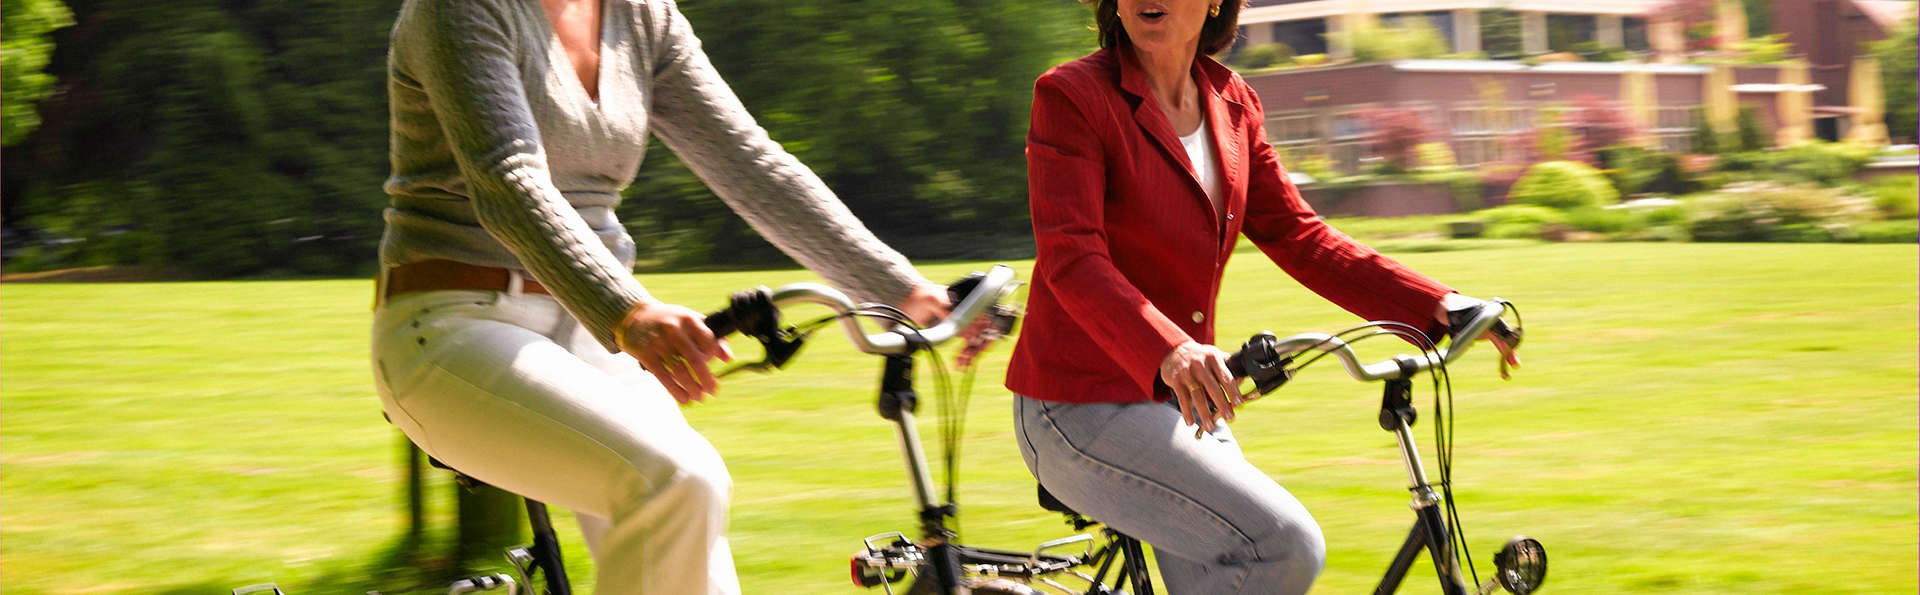 Promenade à vélo à travers le vert des rives de l'Adda jusqu'au Naviglio della Martesana